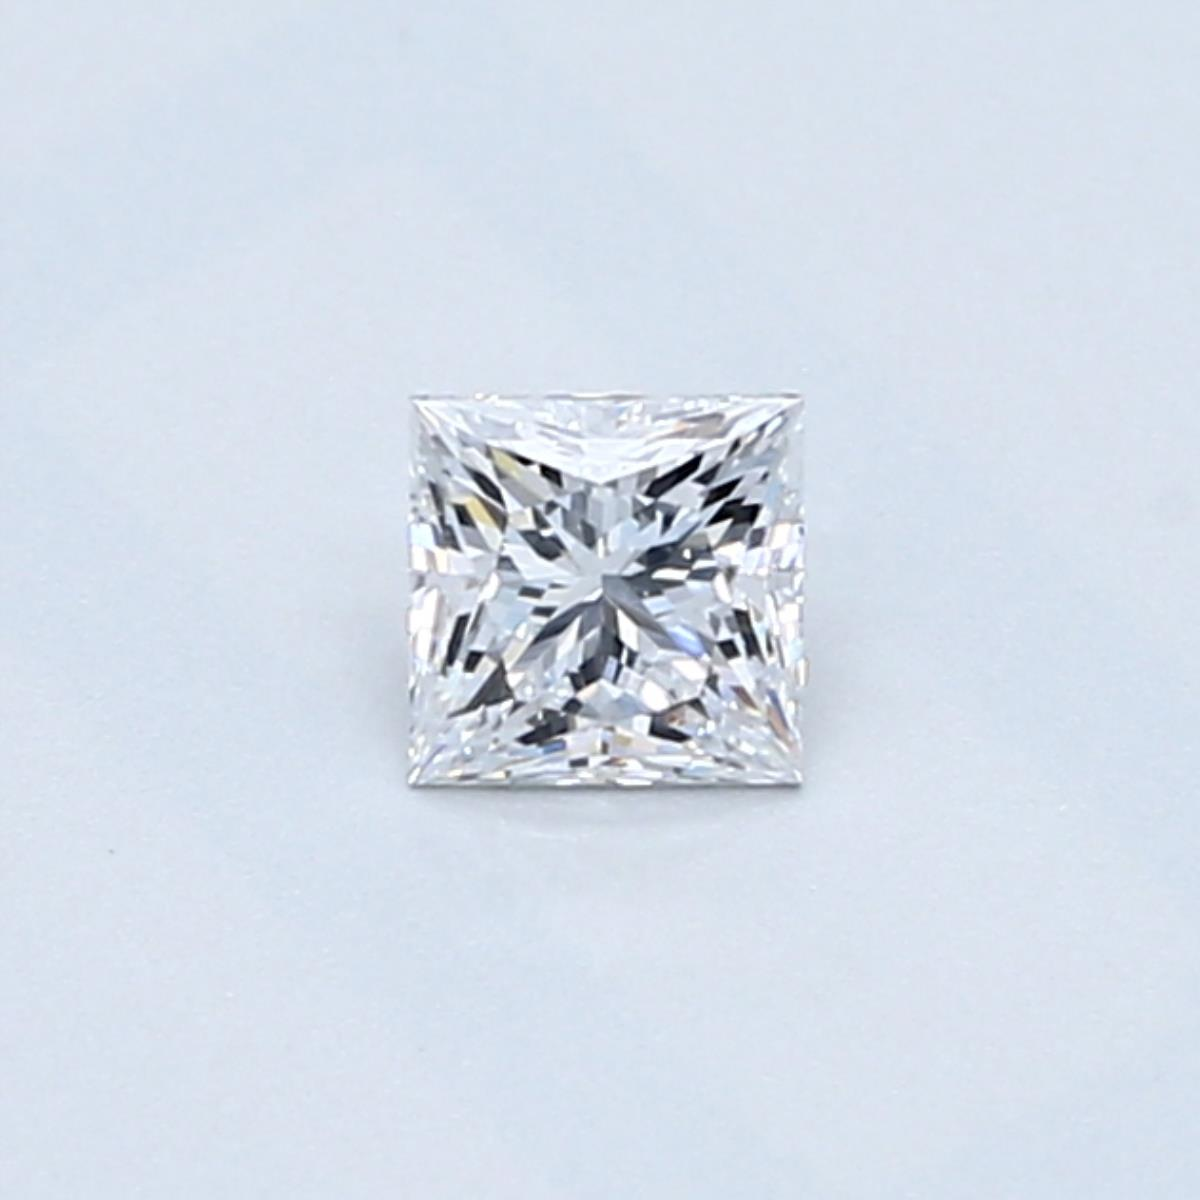 0.31 PR Diamond (D, SI1)